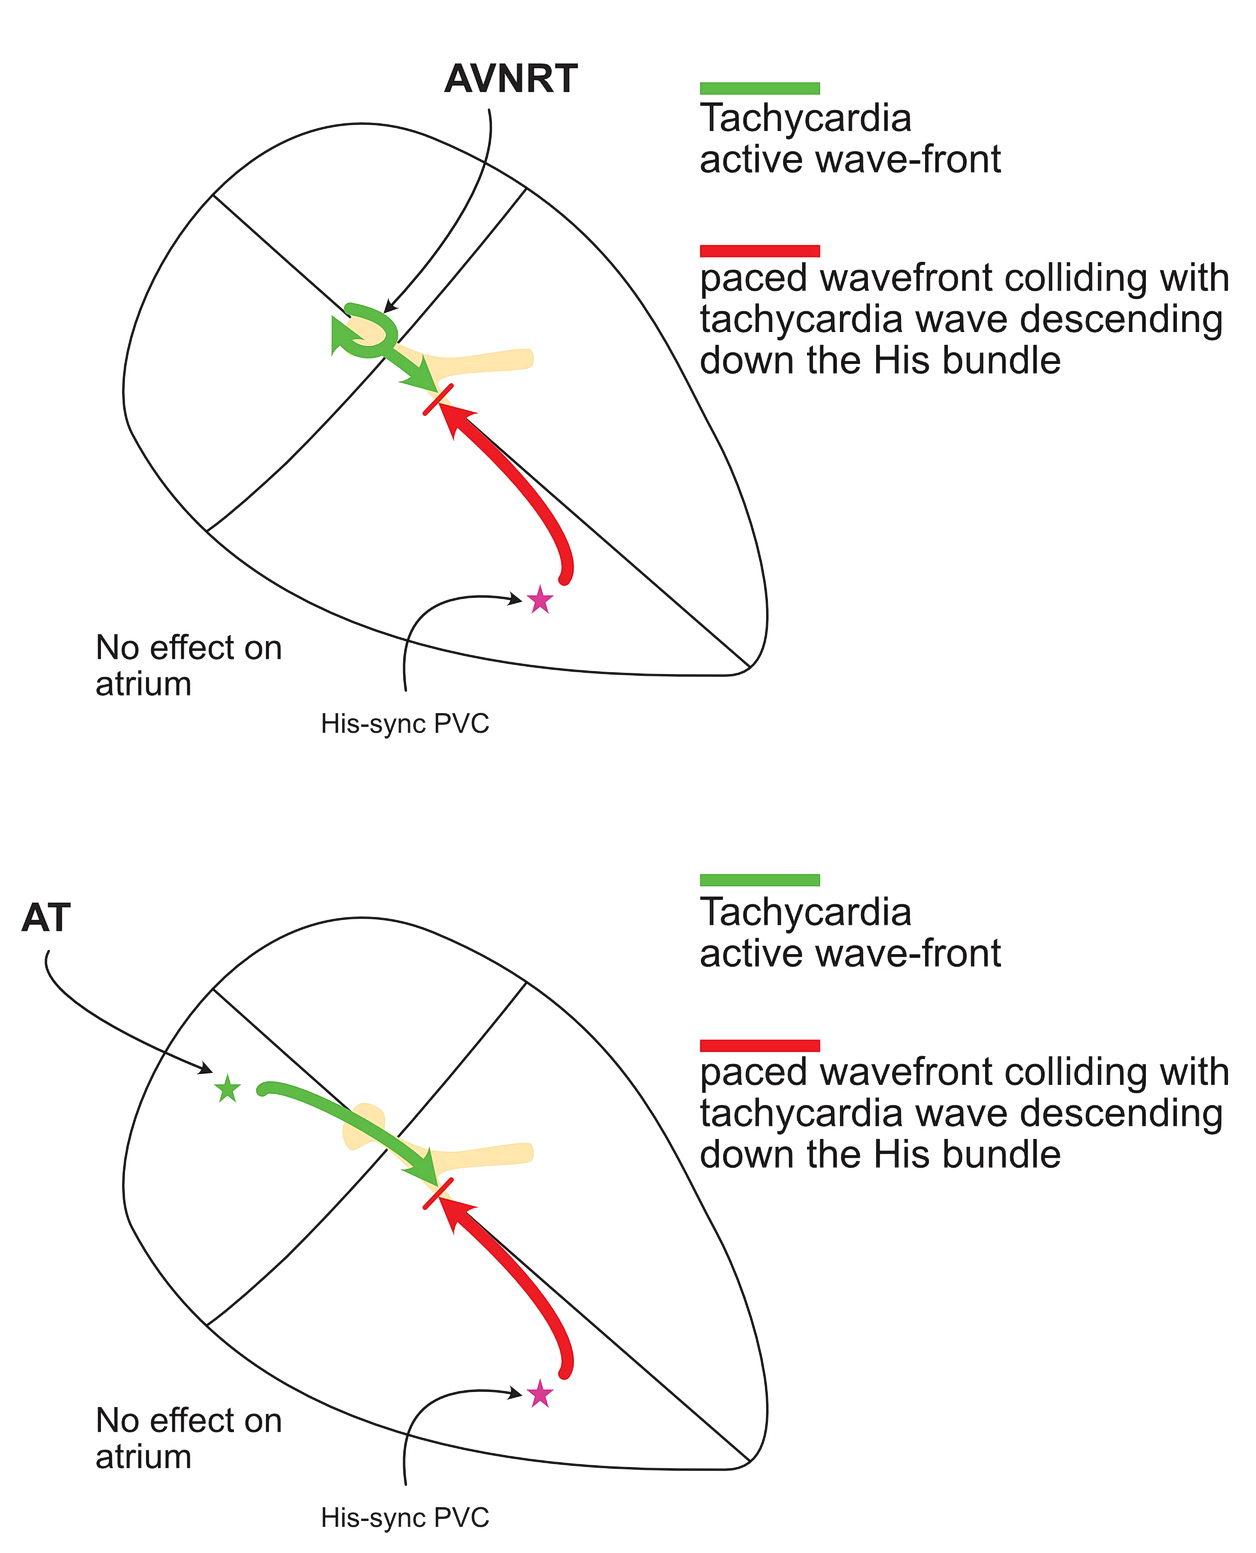 His synchronous ventricular pacing - no effect on av nodal re-entrant tachycardia